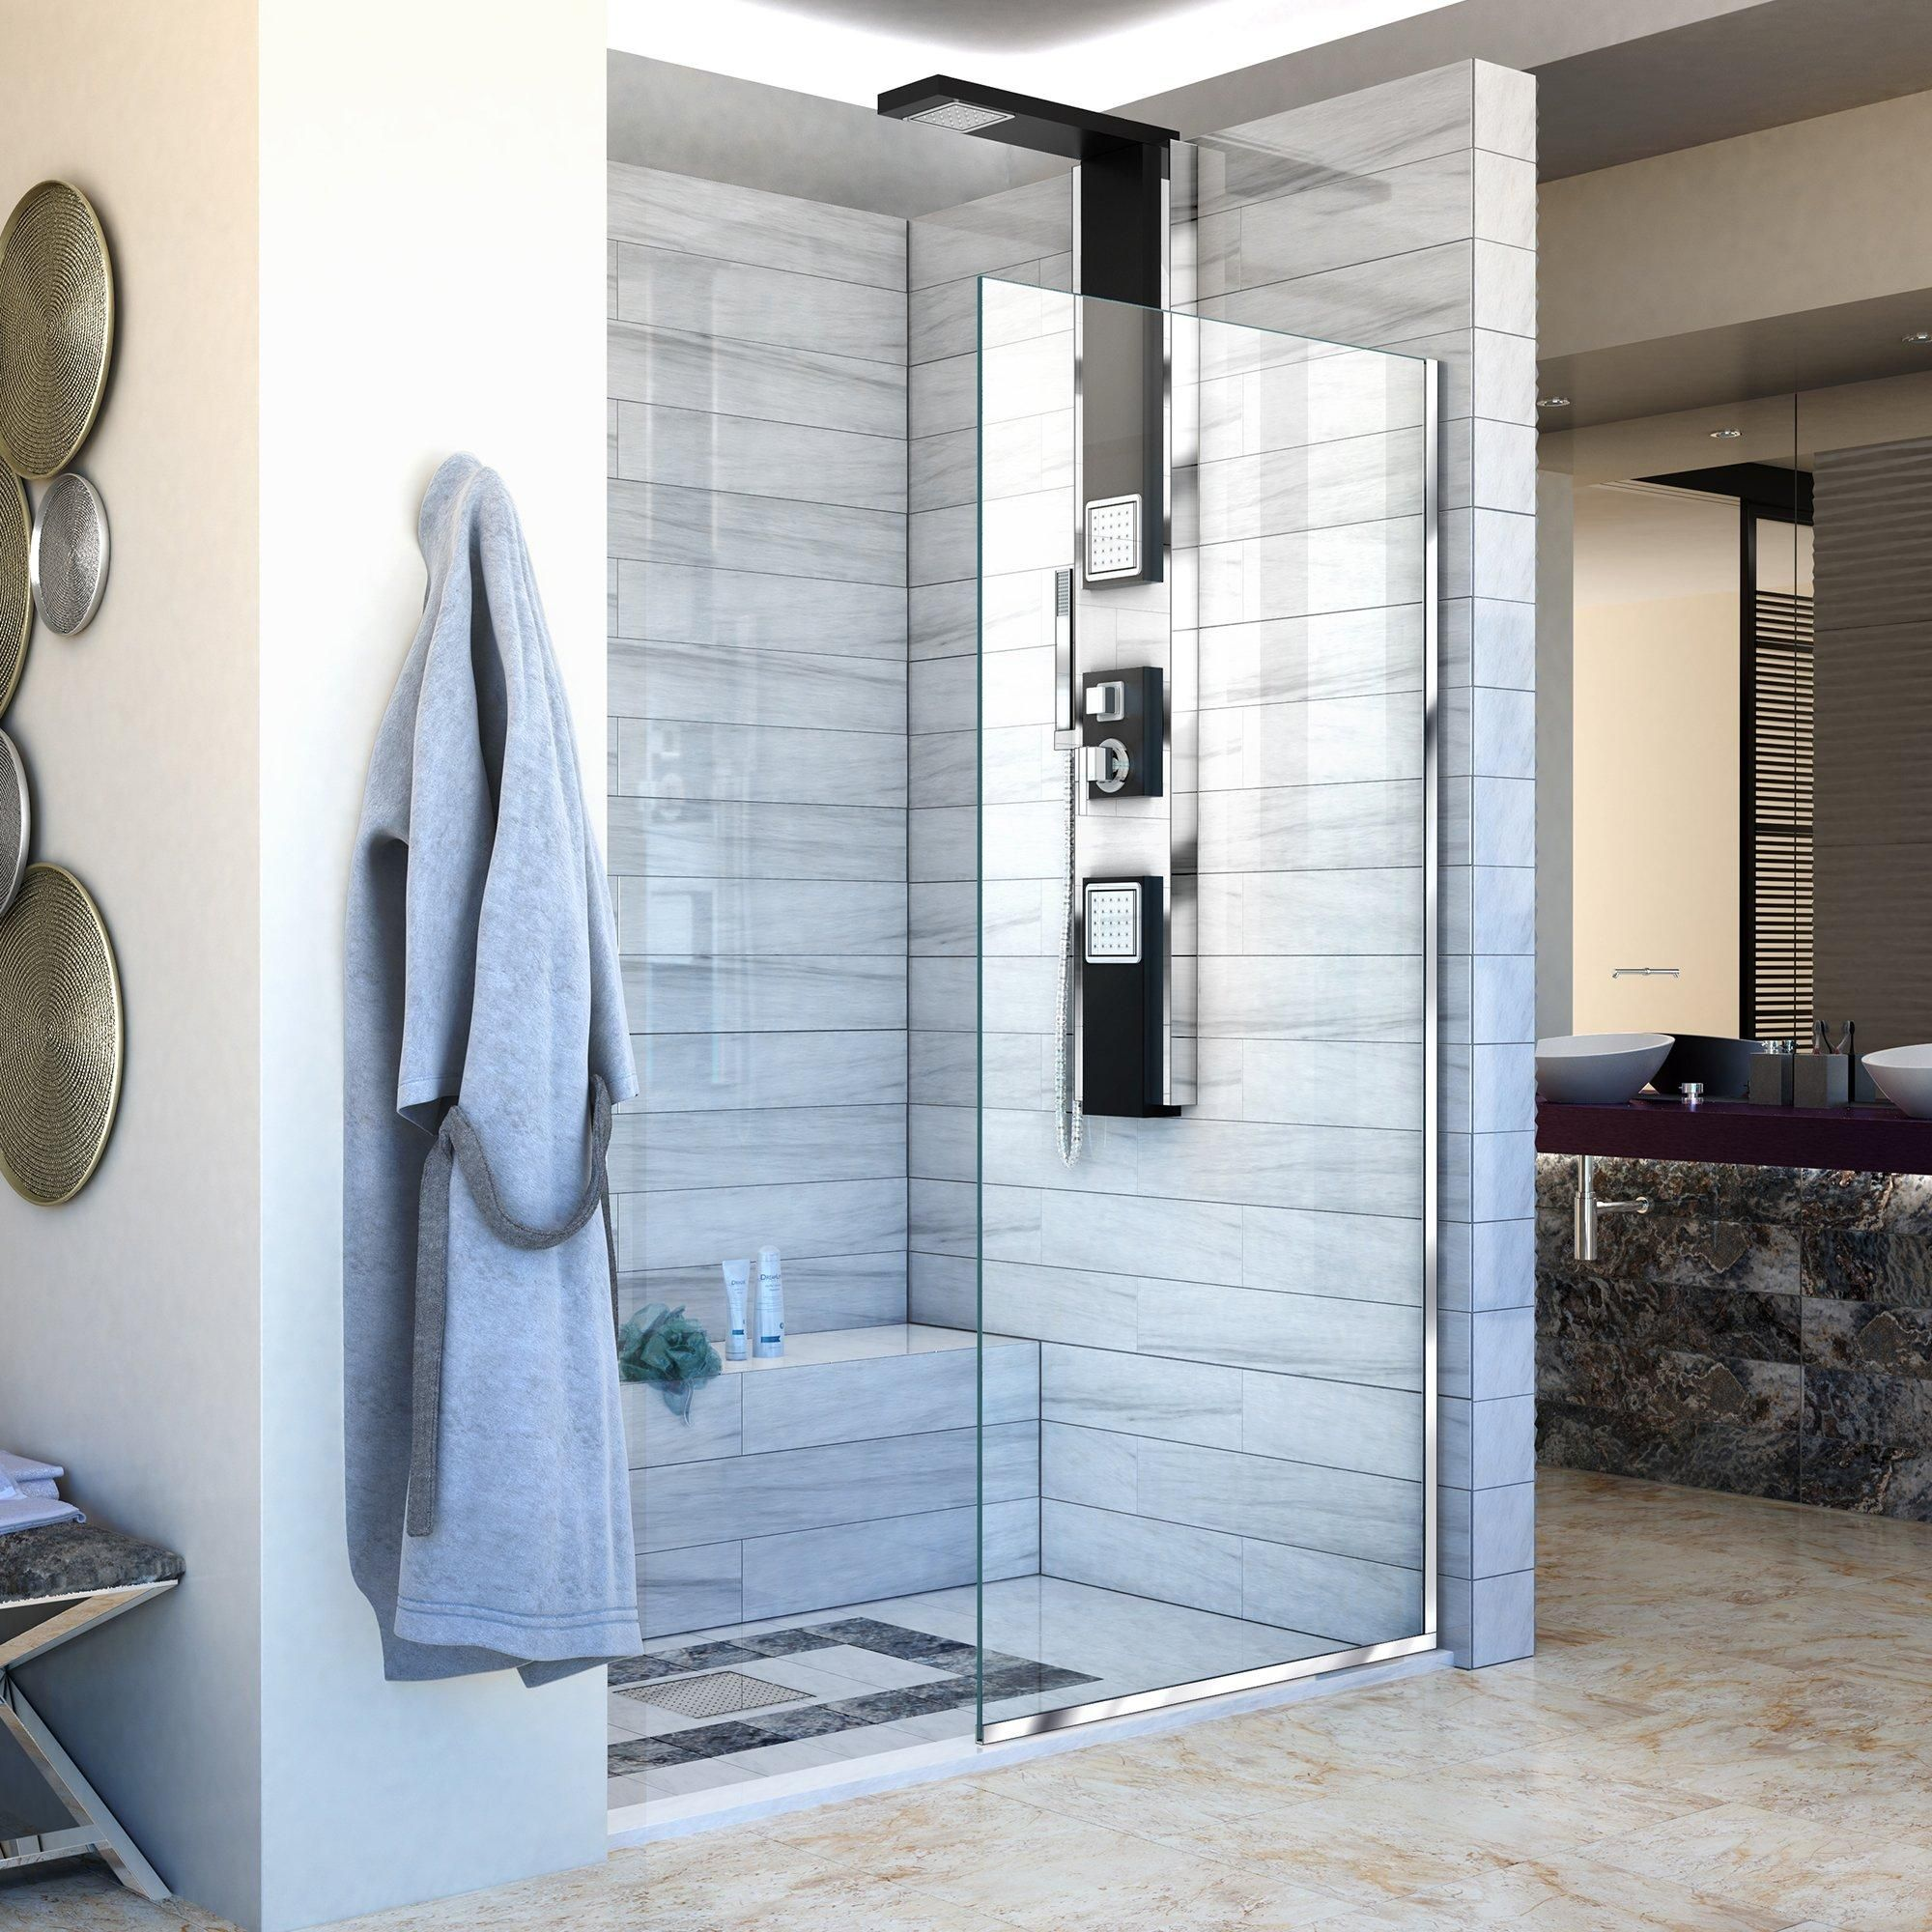 Linea Chrome Single Panel Framless Screen Shower Door In 2020 Shower Doors Black Shower Doors Shower Screen